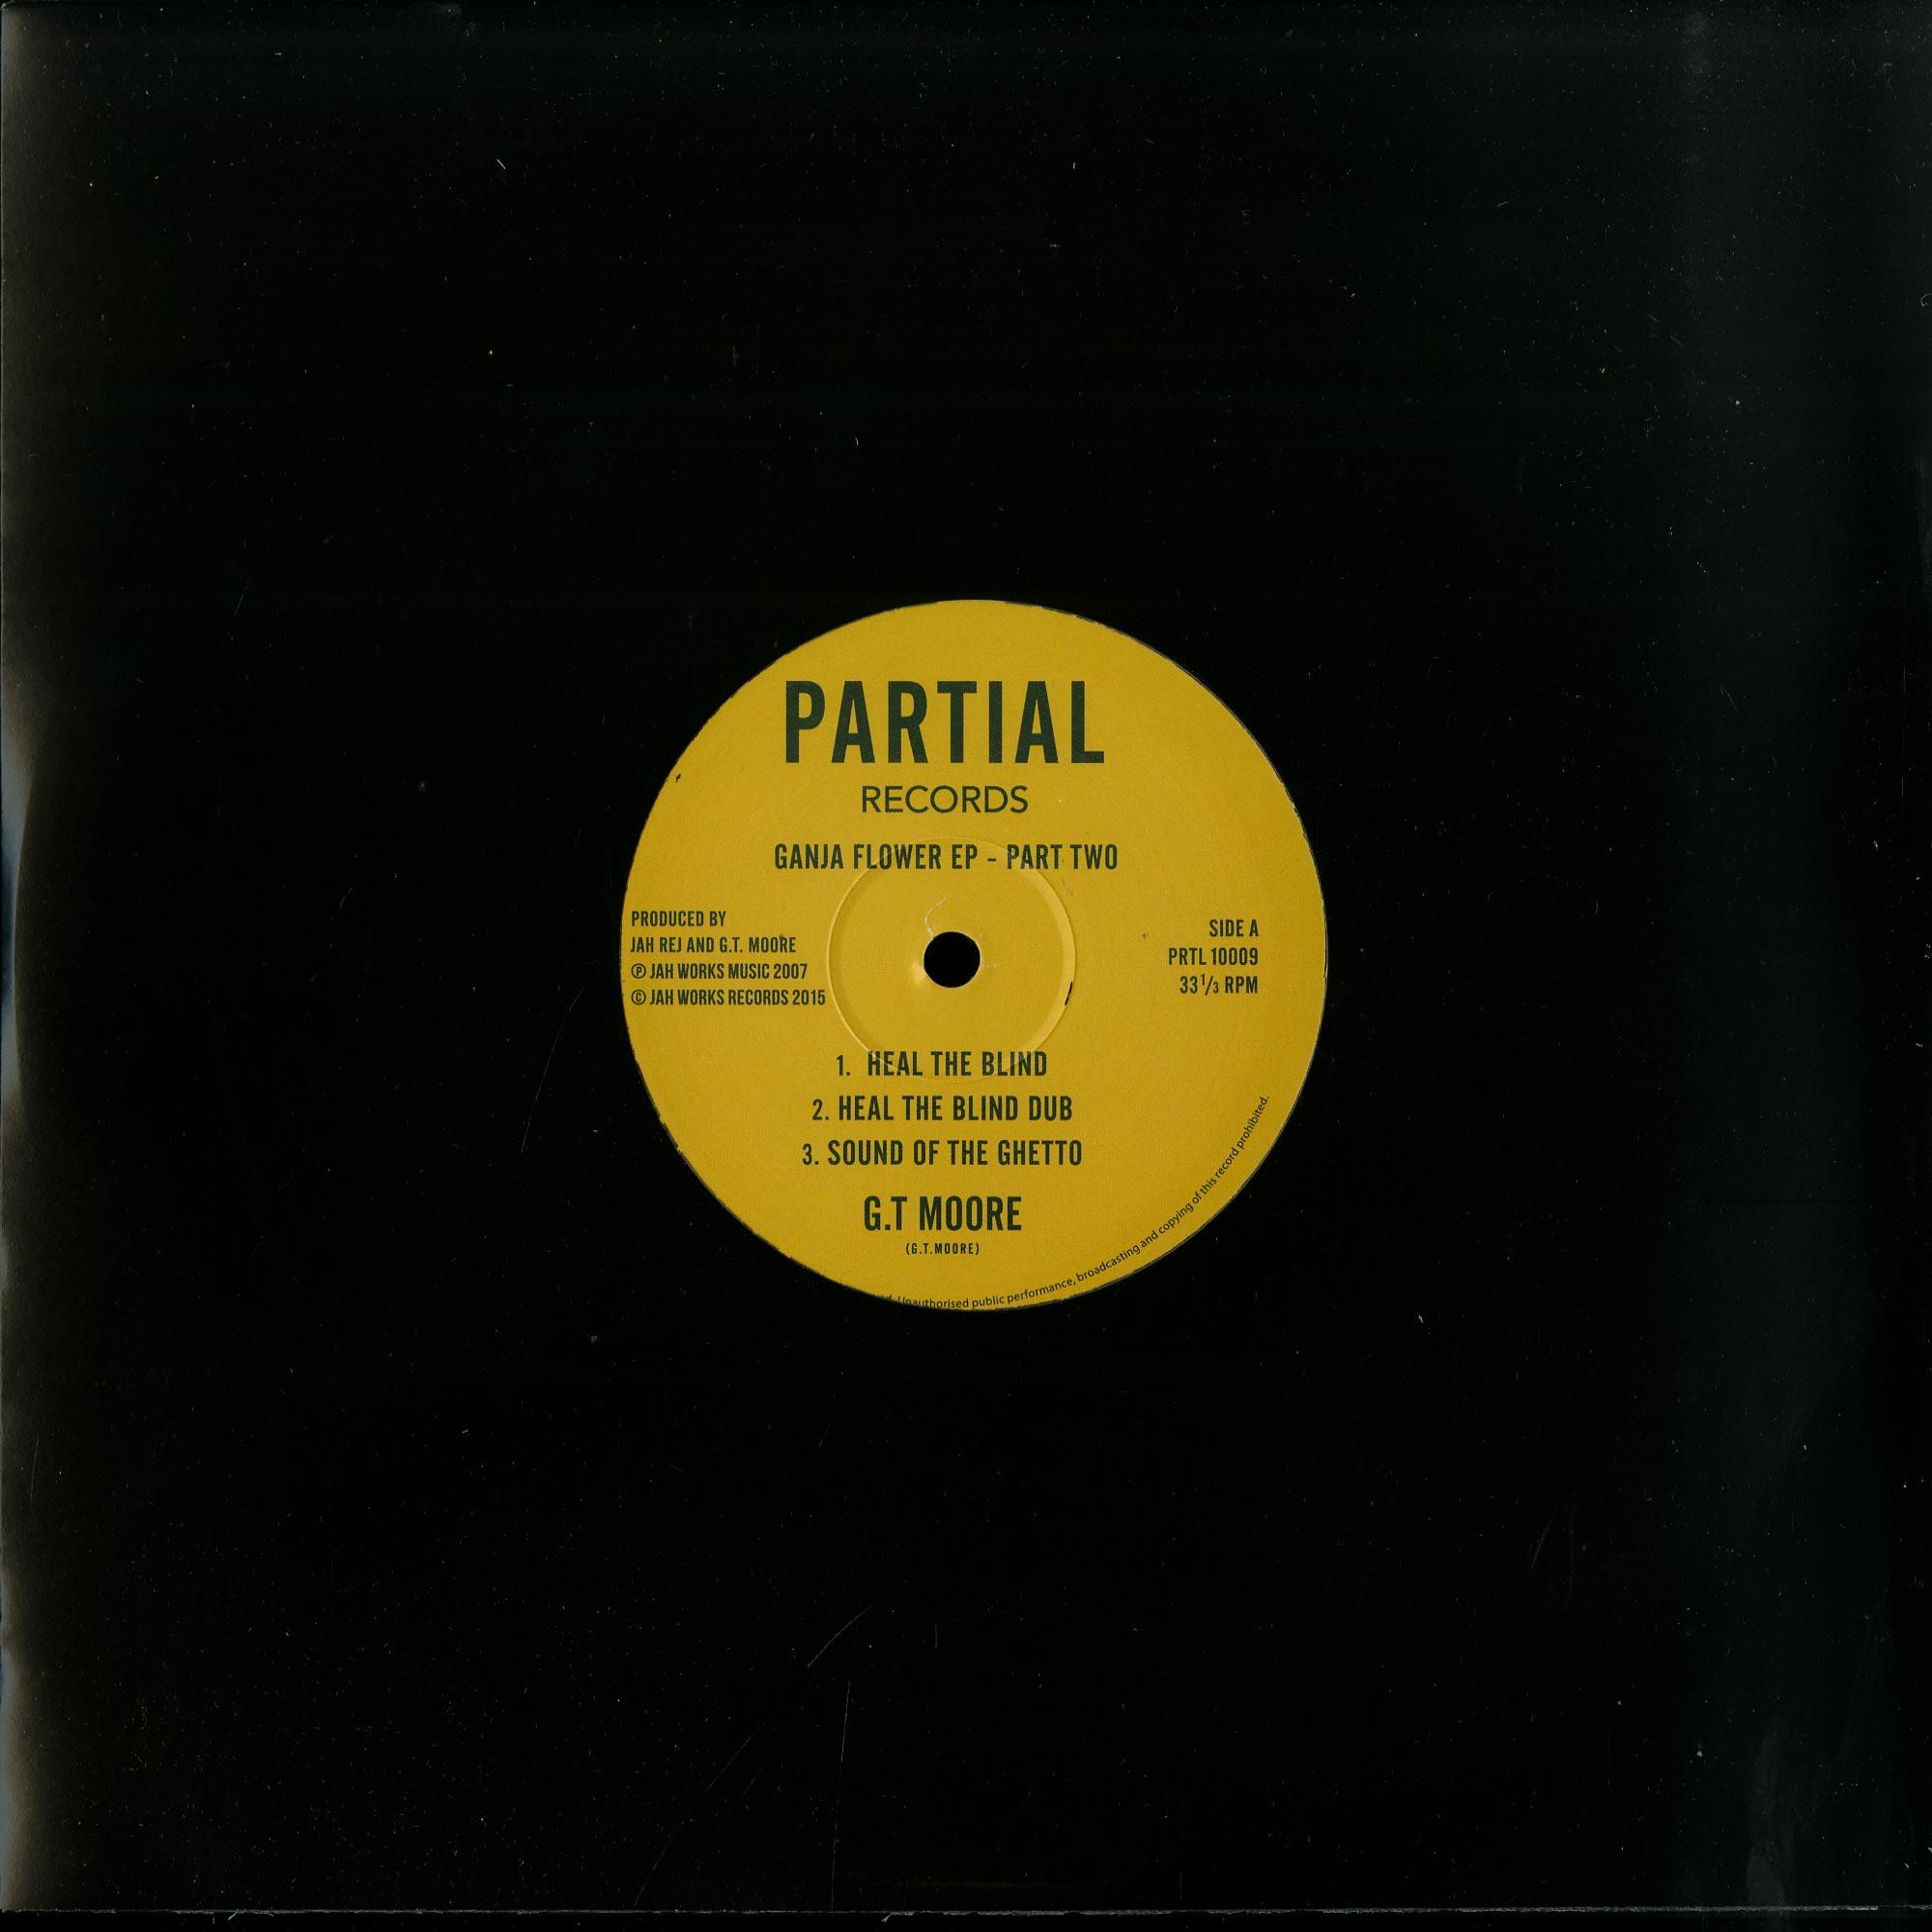 G.T Moore - GANJA FLOWER EP PART TWO